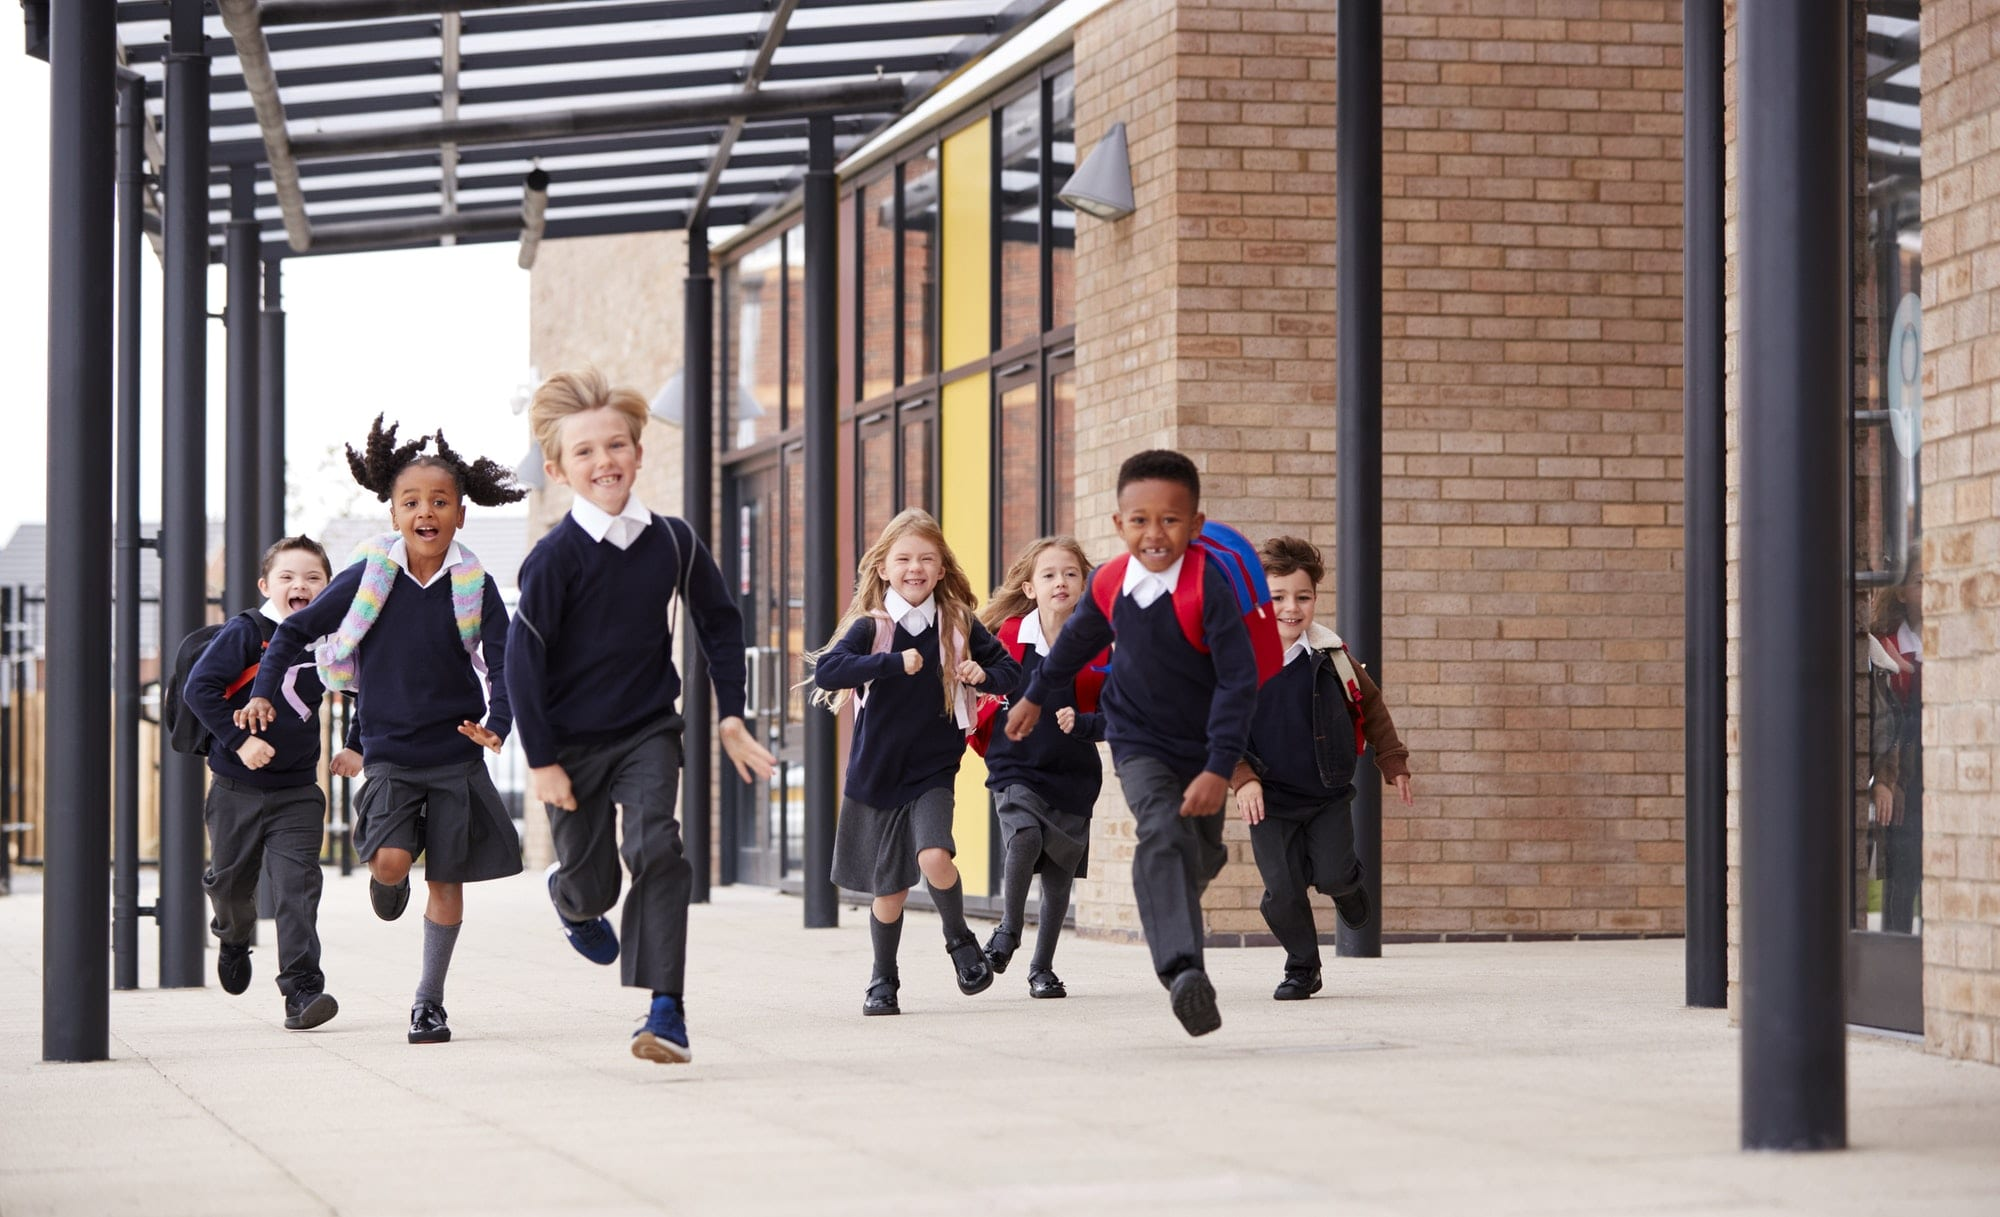 Primary school kids, wearing school uniforms and backpacks, running on a walkway